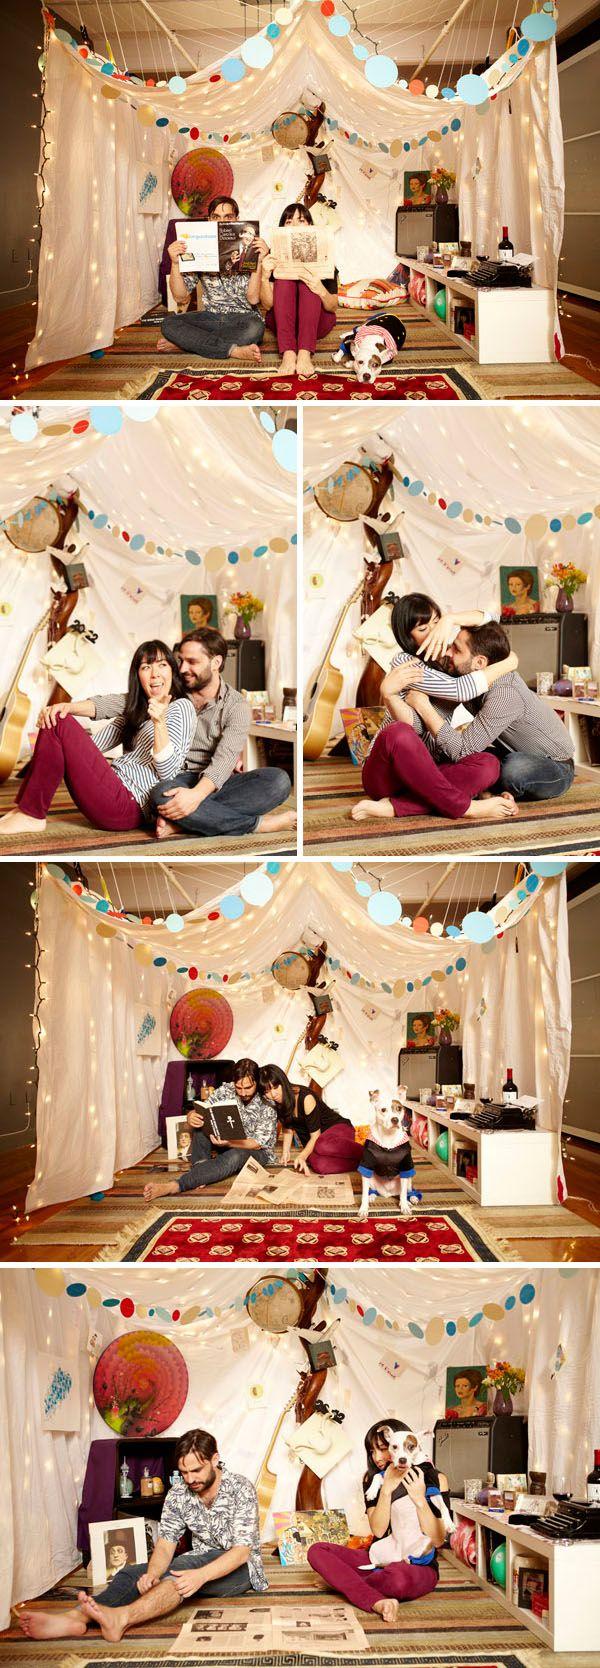 [images from Alexandra Meseke] Alexandra Meseke is a member of Brooklyn Bride's preferred vendor listings.